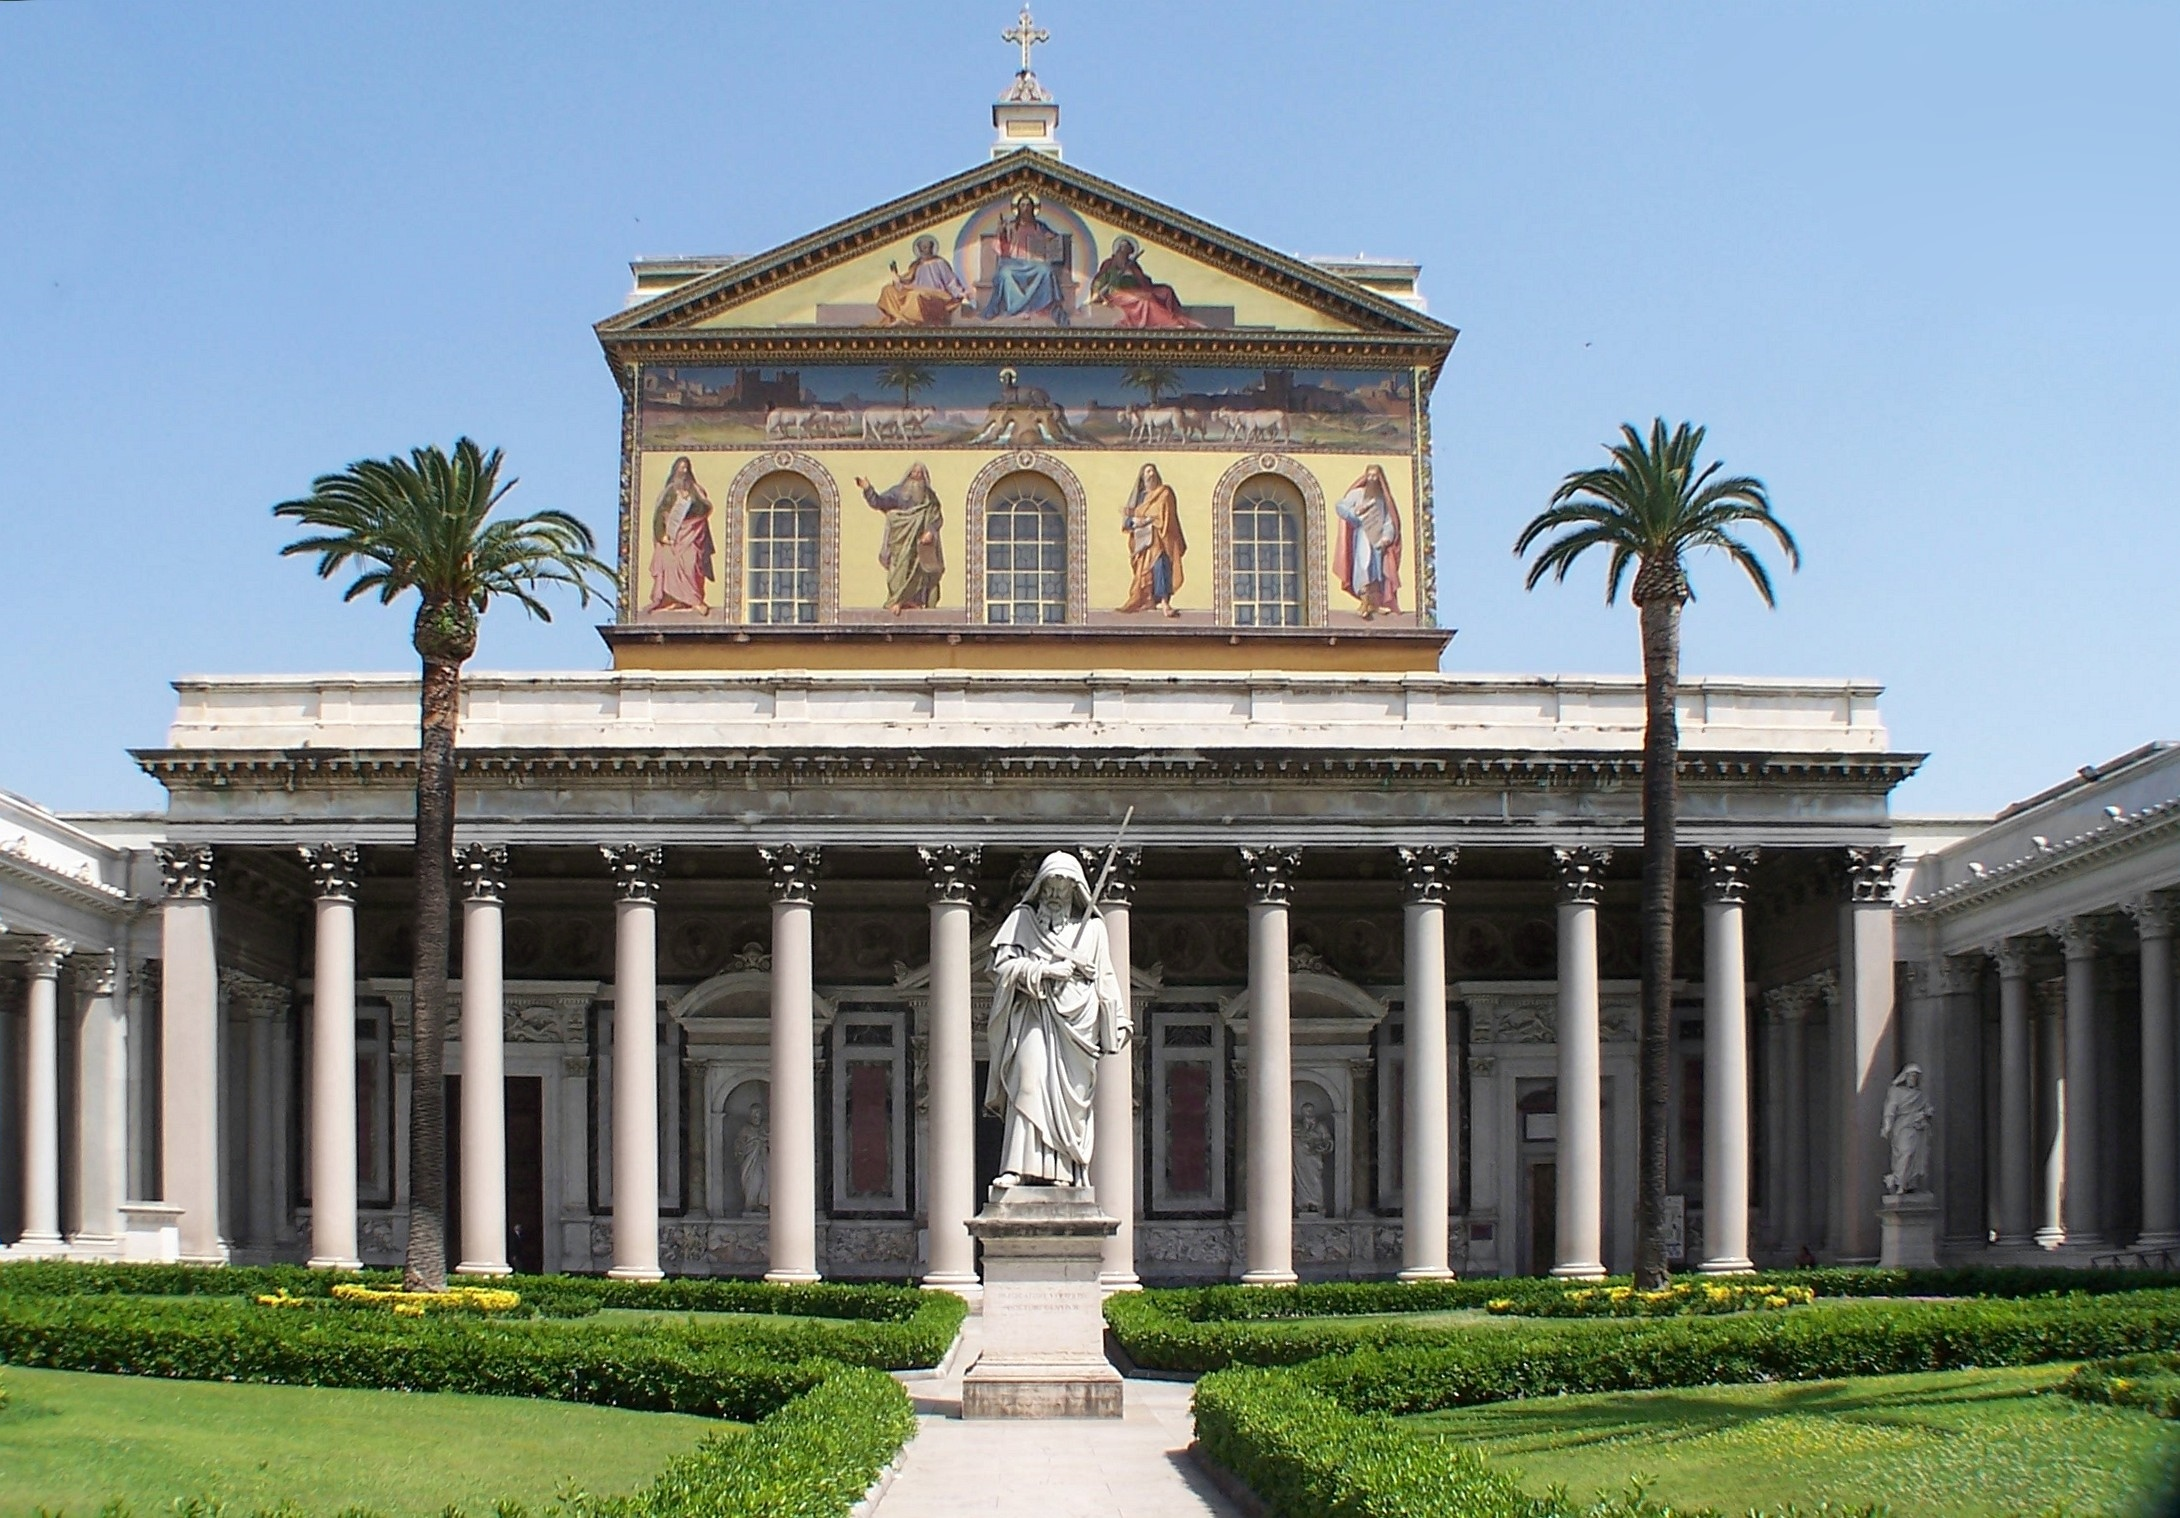 http://upload.wikimedia.org/wikipedia/commons/8/89/Roma_San_Paolo_fuori_le_mura_BW_1.JPG